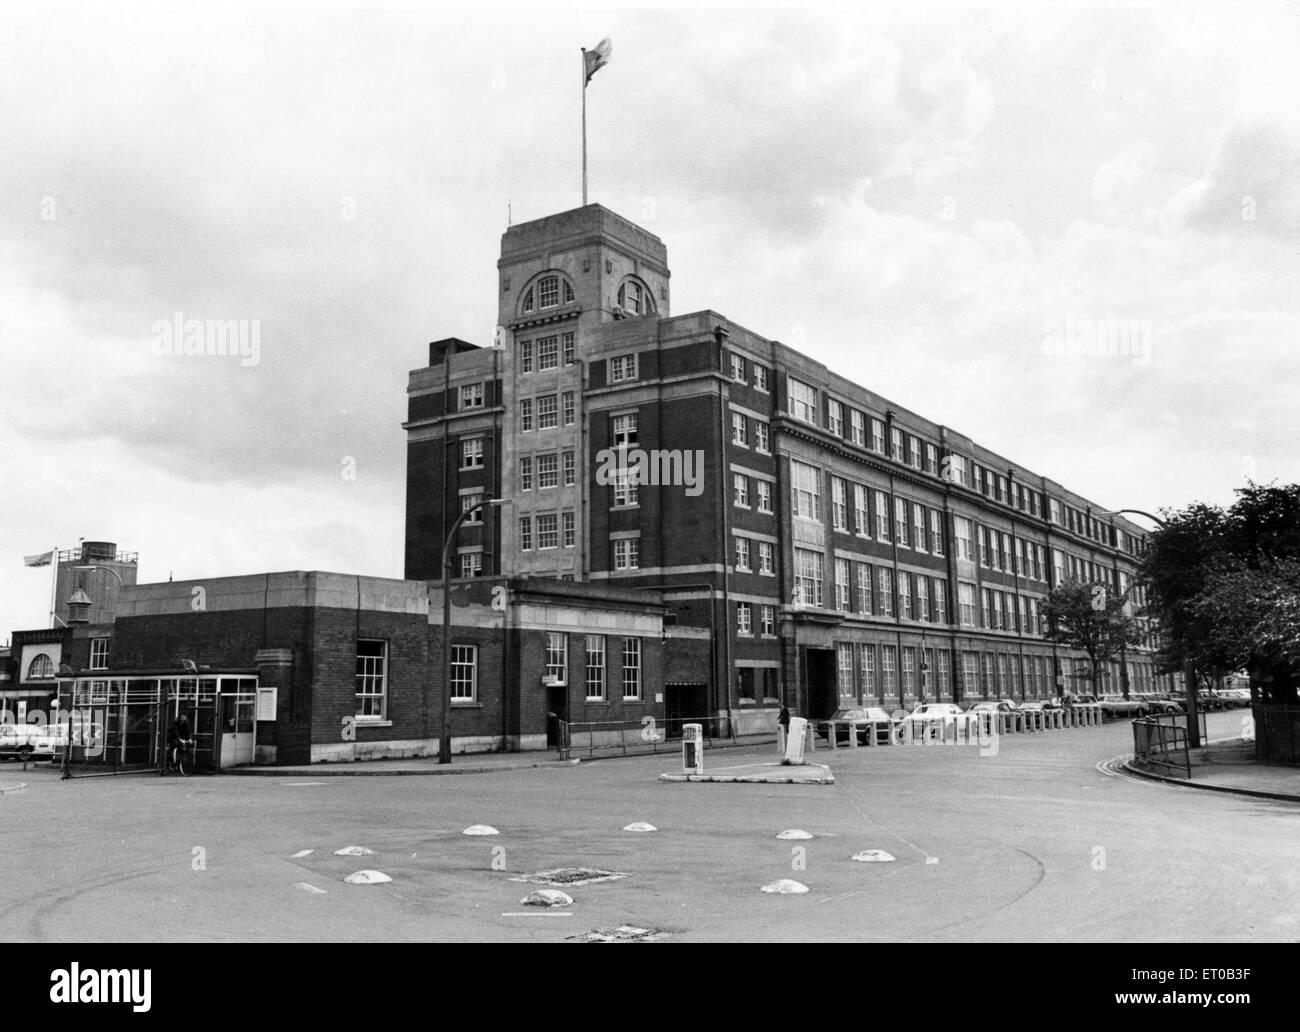 Fort Dunlop en Birmingham. El 13 de mayo de 1983. Imagen De Stock